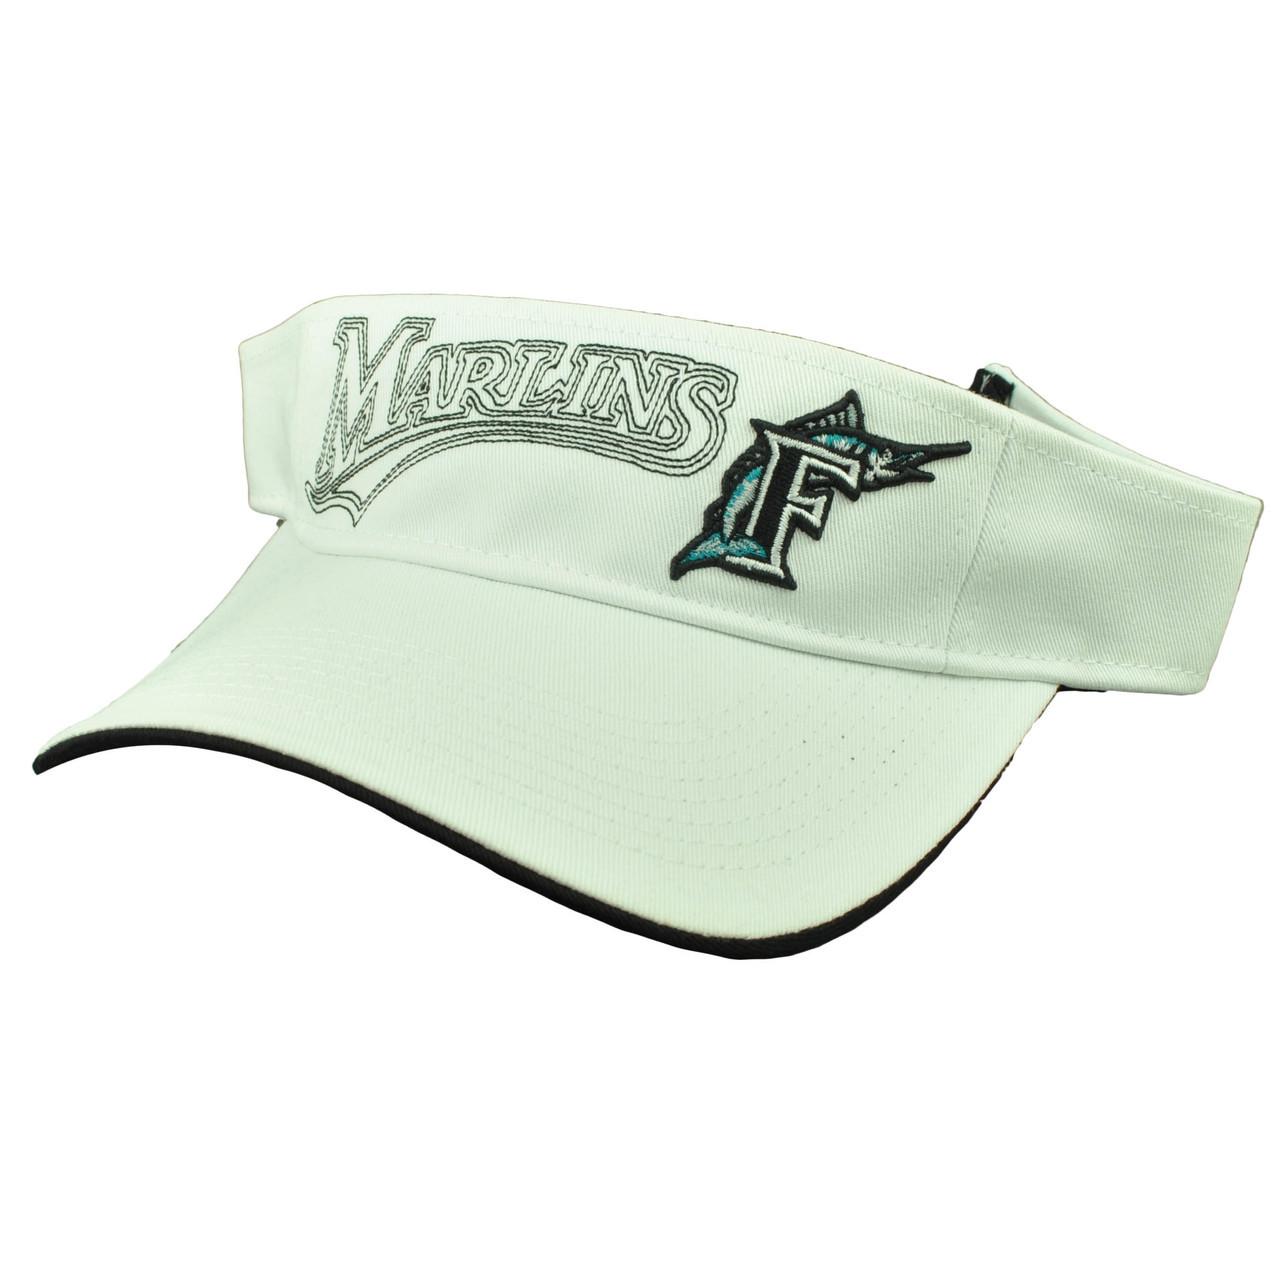 new style 24887 5e72c Florida Miami Marlins White Visor Sun Hat Baseball Old Logo Vintage  Adjustable - Sinbad Sports Store